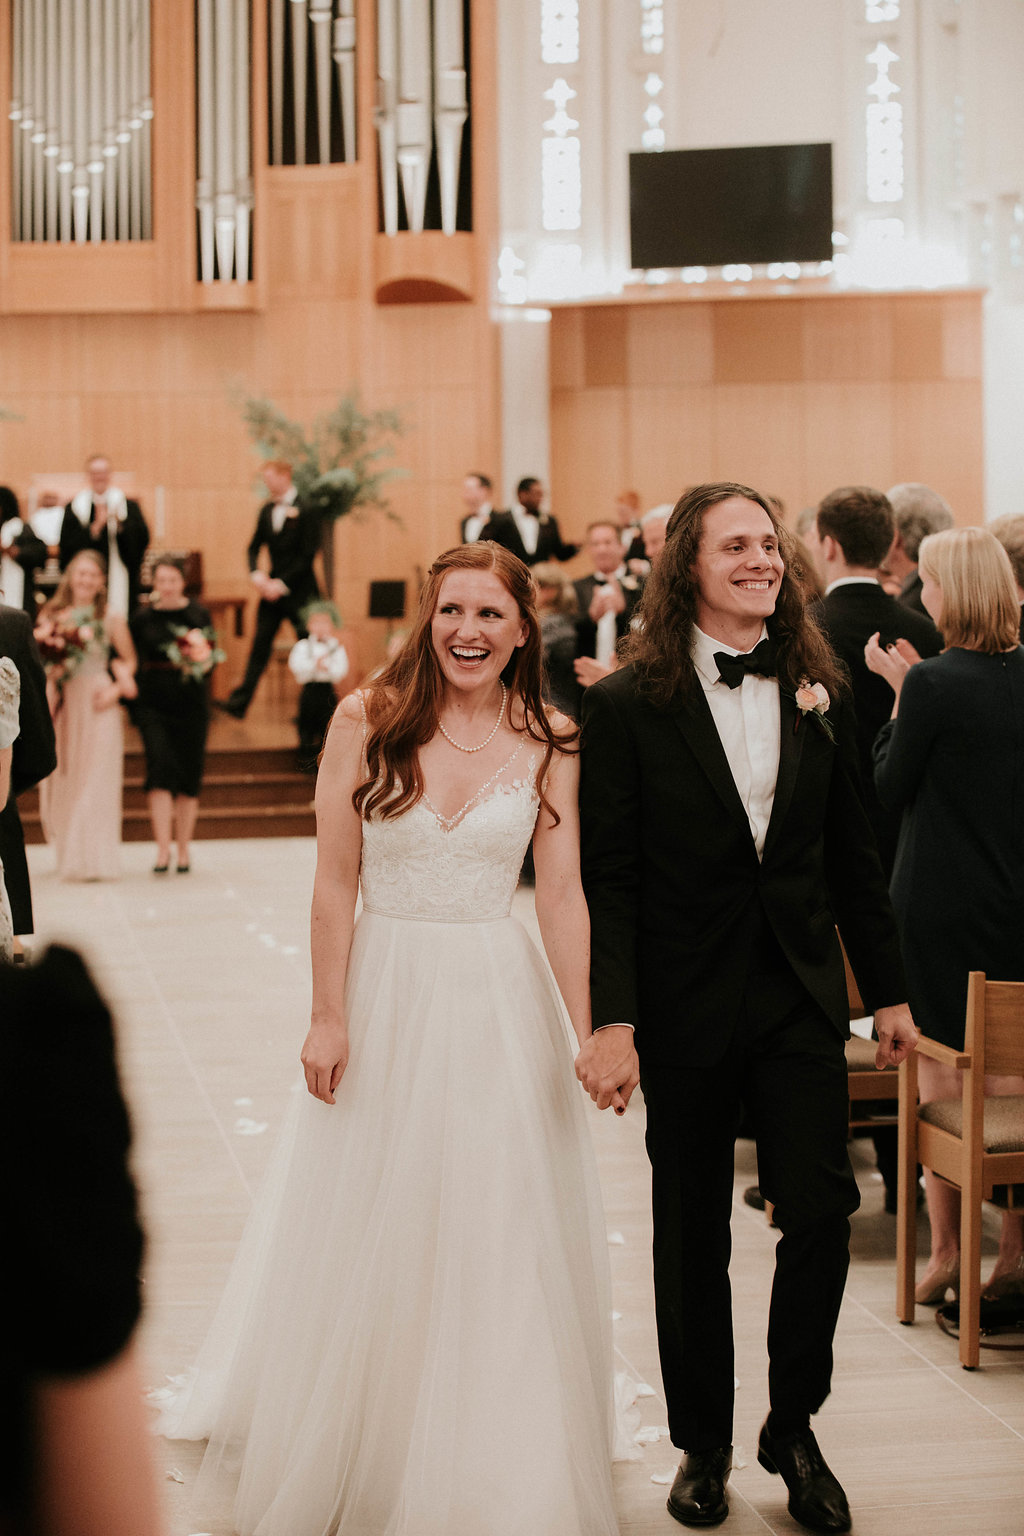 Lily+Jonathan_Fairmont_Olympic_hotel_wedding_Seattle_wedding_photographer_406.JPG